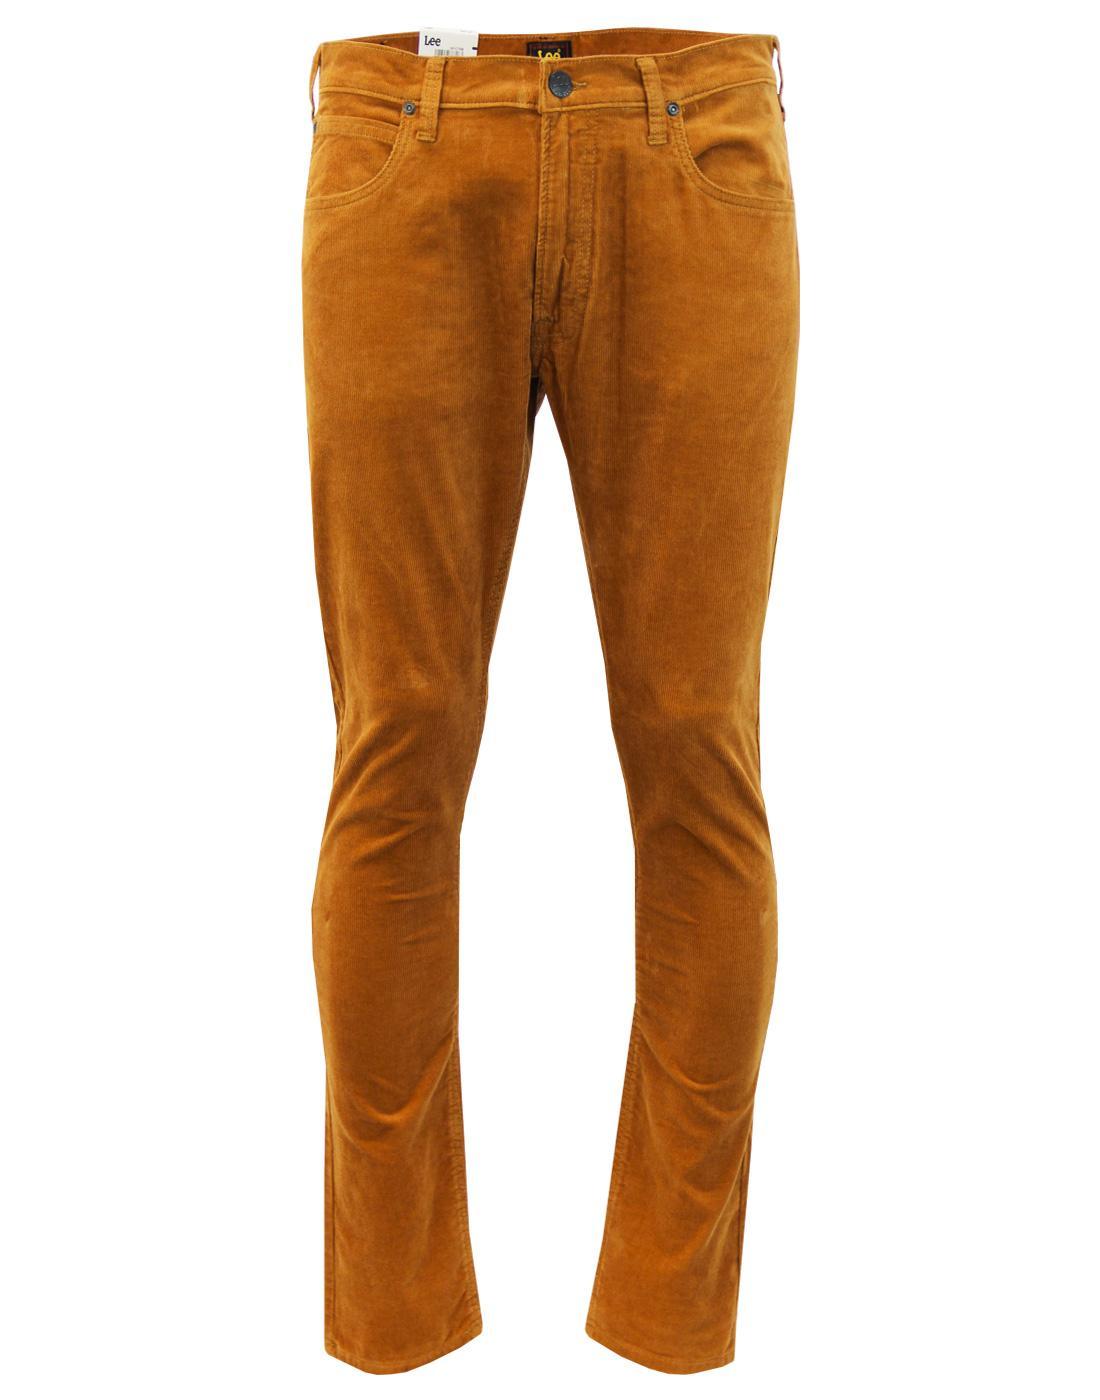 Luke LEE Retro Mod Slim Tapered Cord Jeans COGNAC